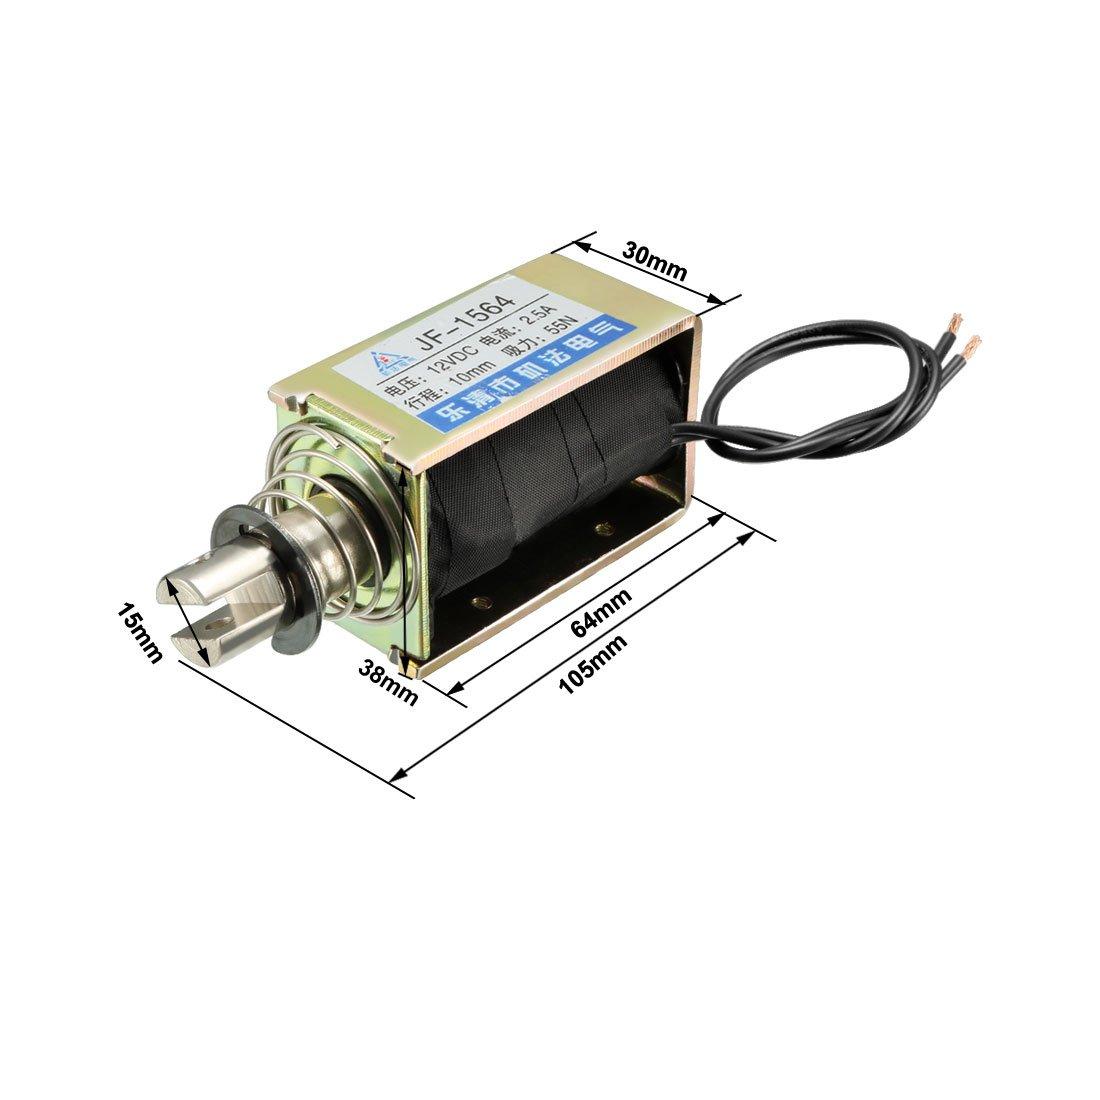 Spring Loaded Push-Pull Open Frame Solenoid Electromagnet 10mm 5kg DC 12V 400A Uxcell a14123000ux0135